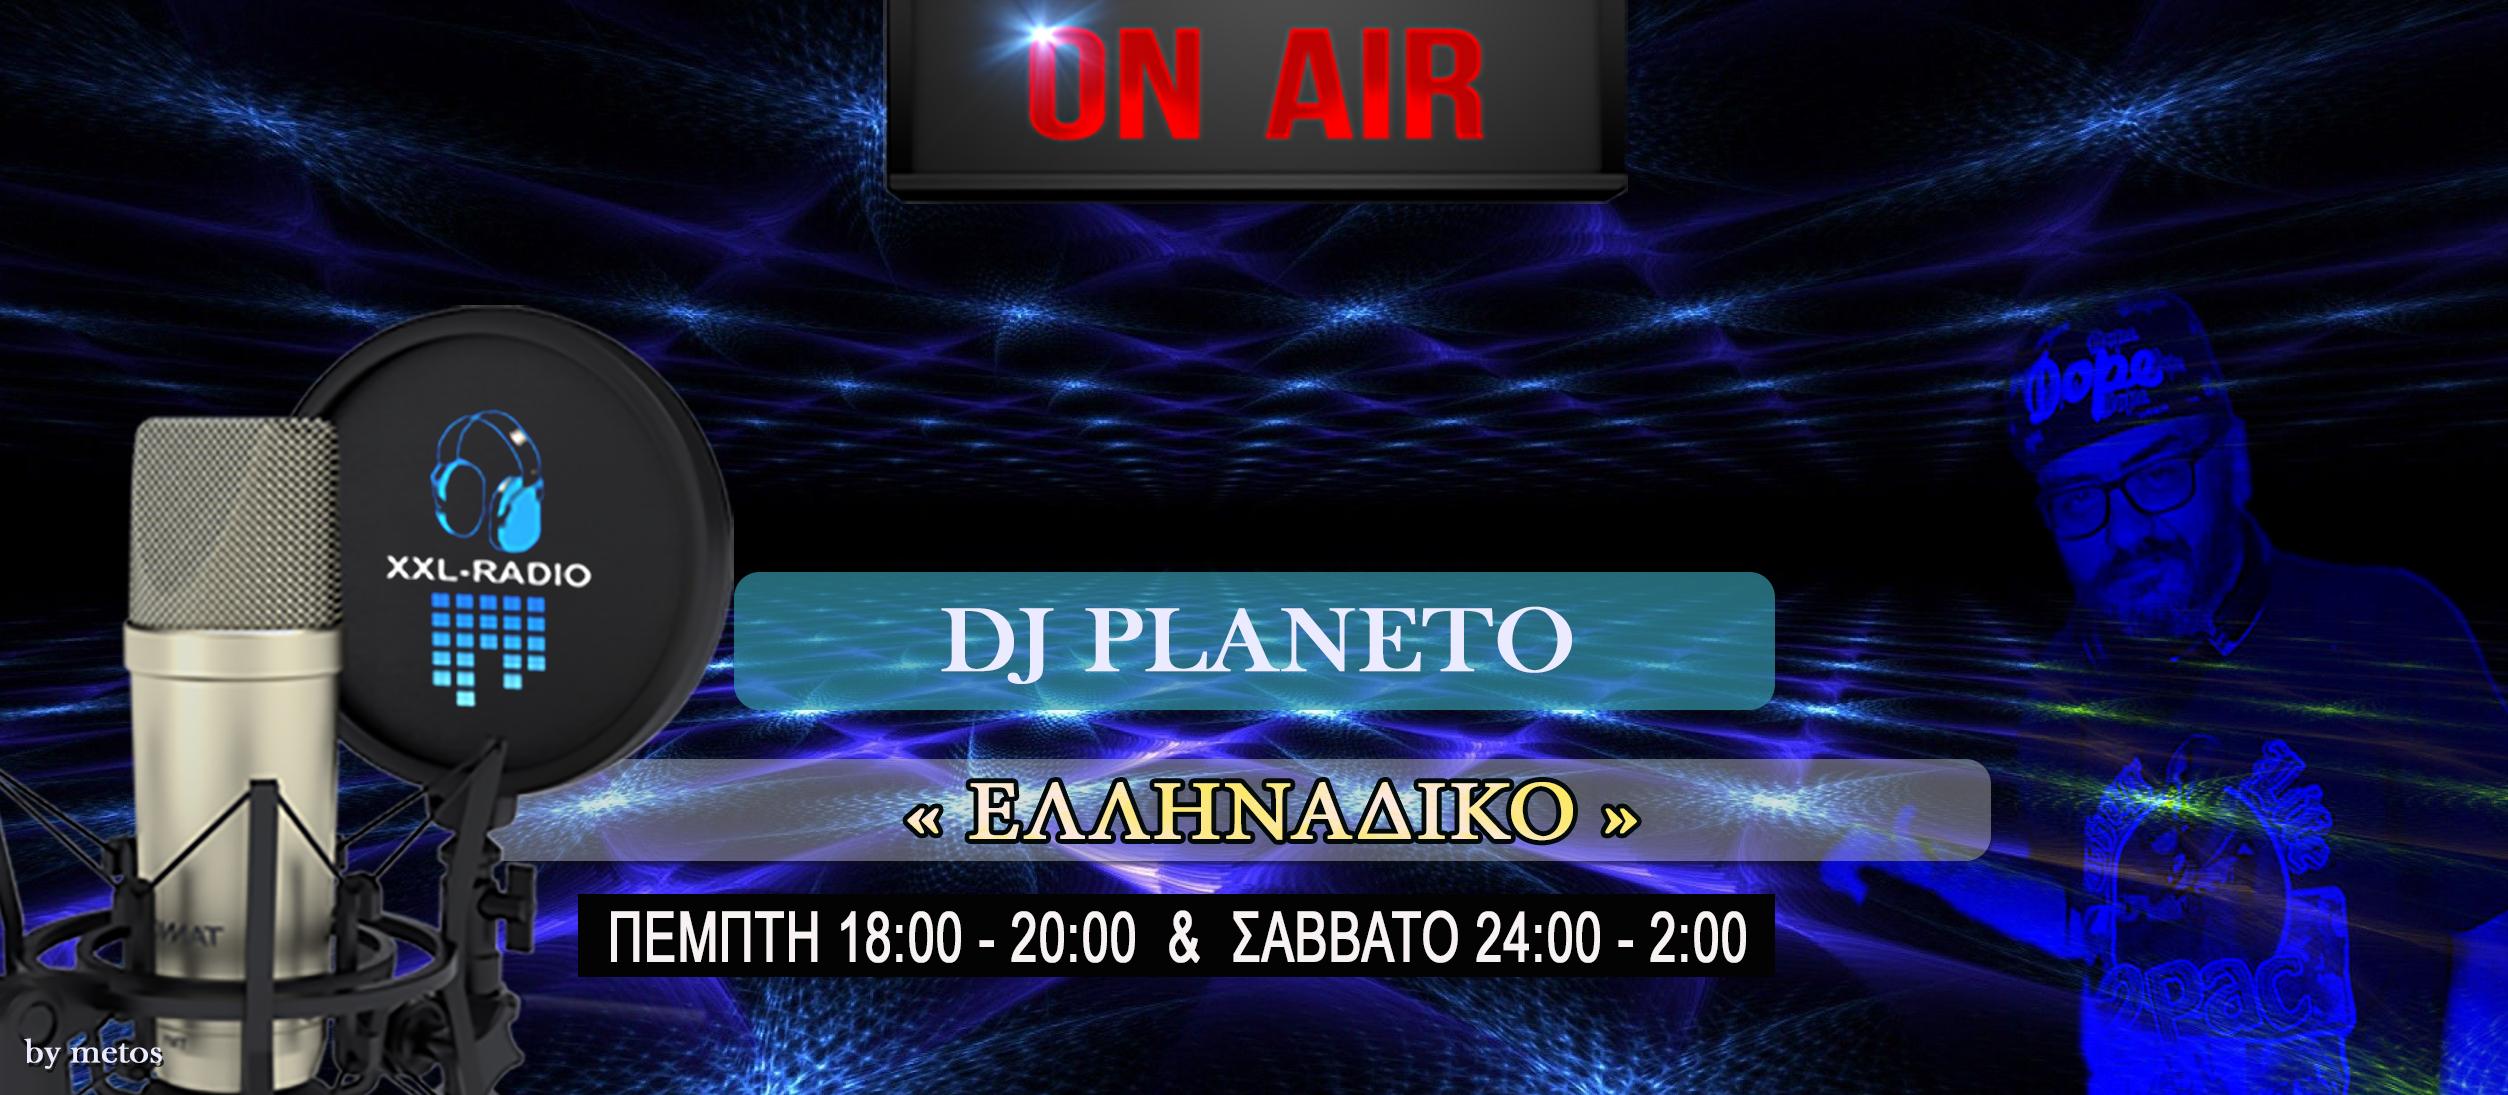 DJ PLANETO